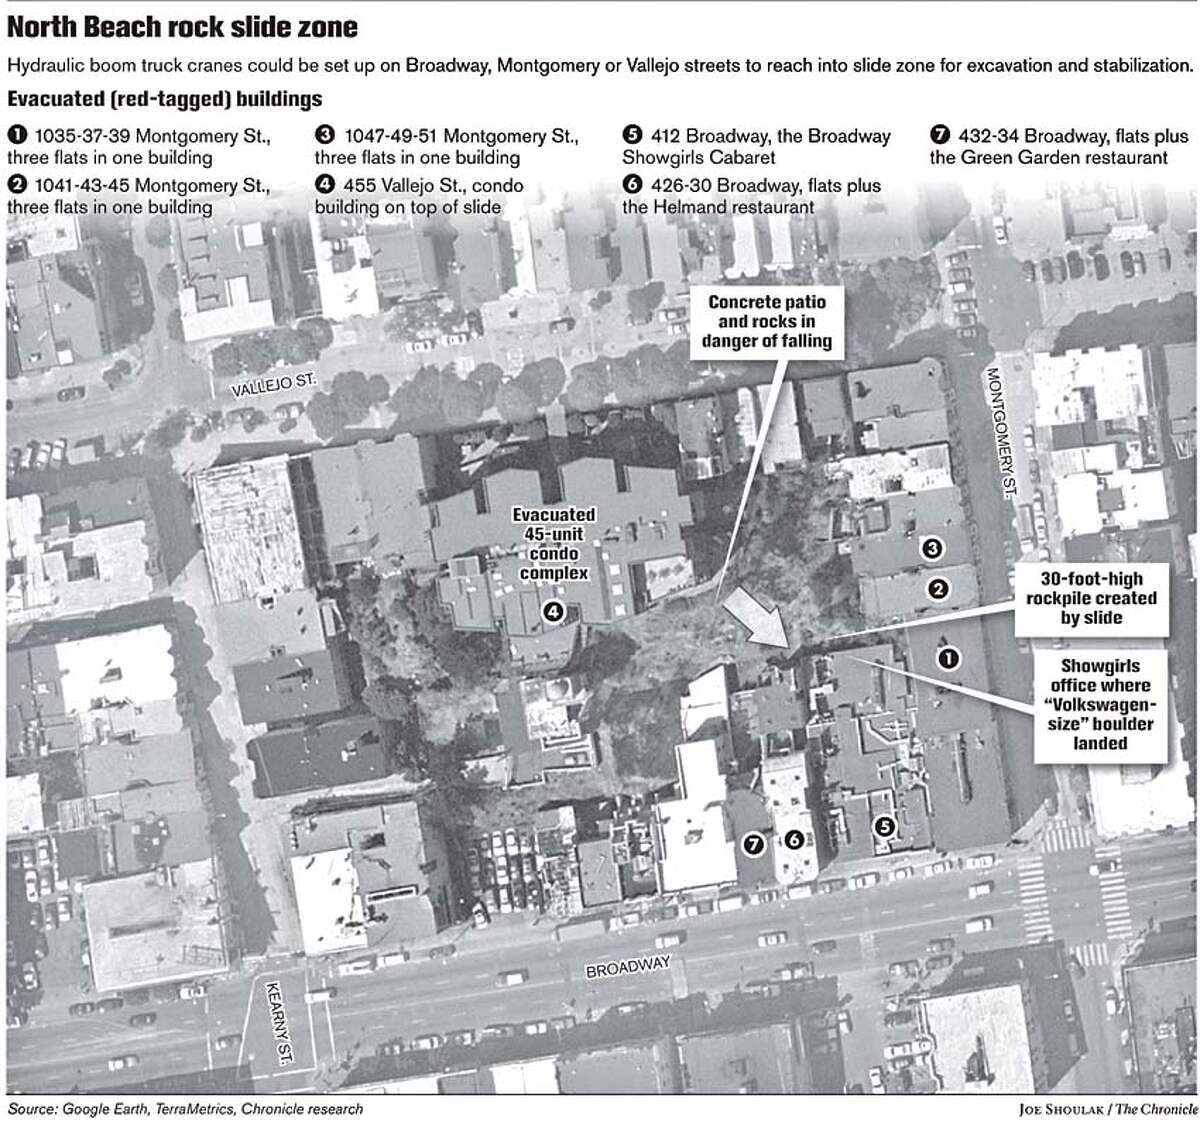 North Beach Rock Slide Zone. Chronicle graphic by Joe Shoulak